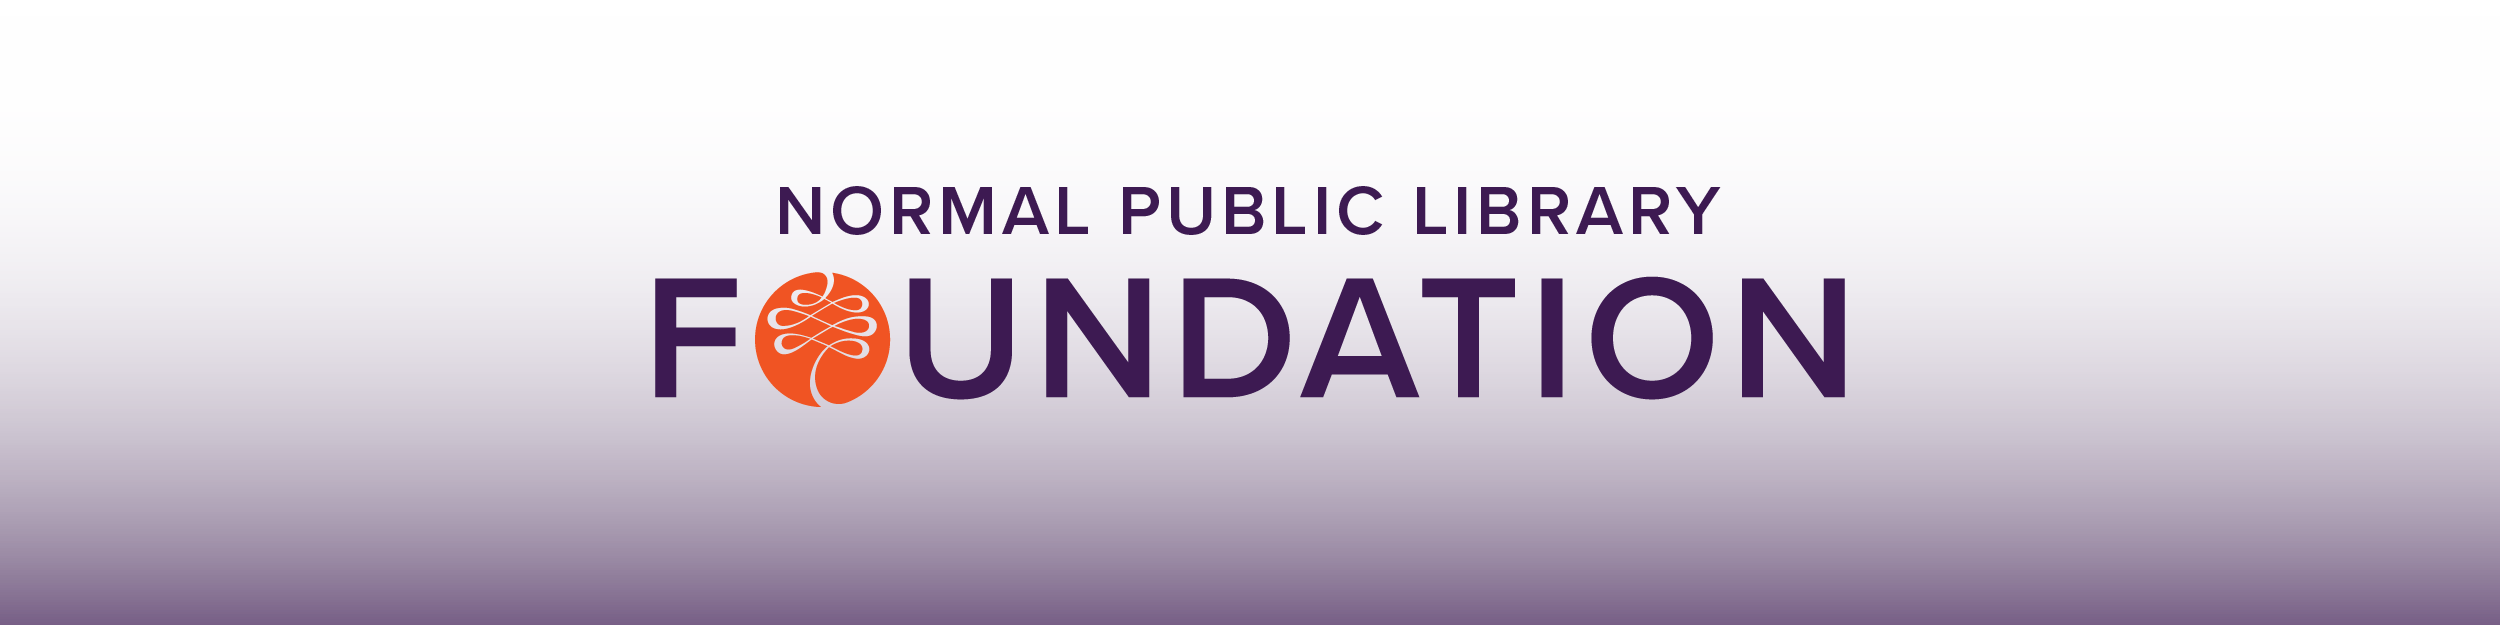 Normal Public Library Foundation Logo